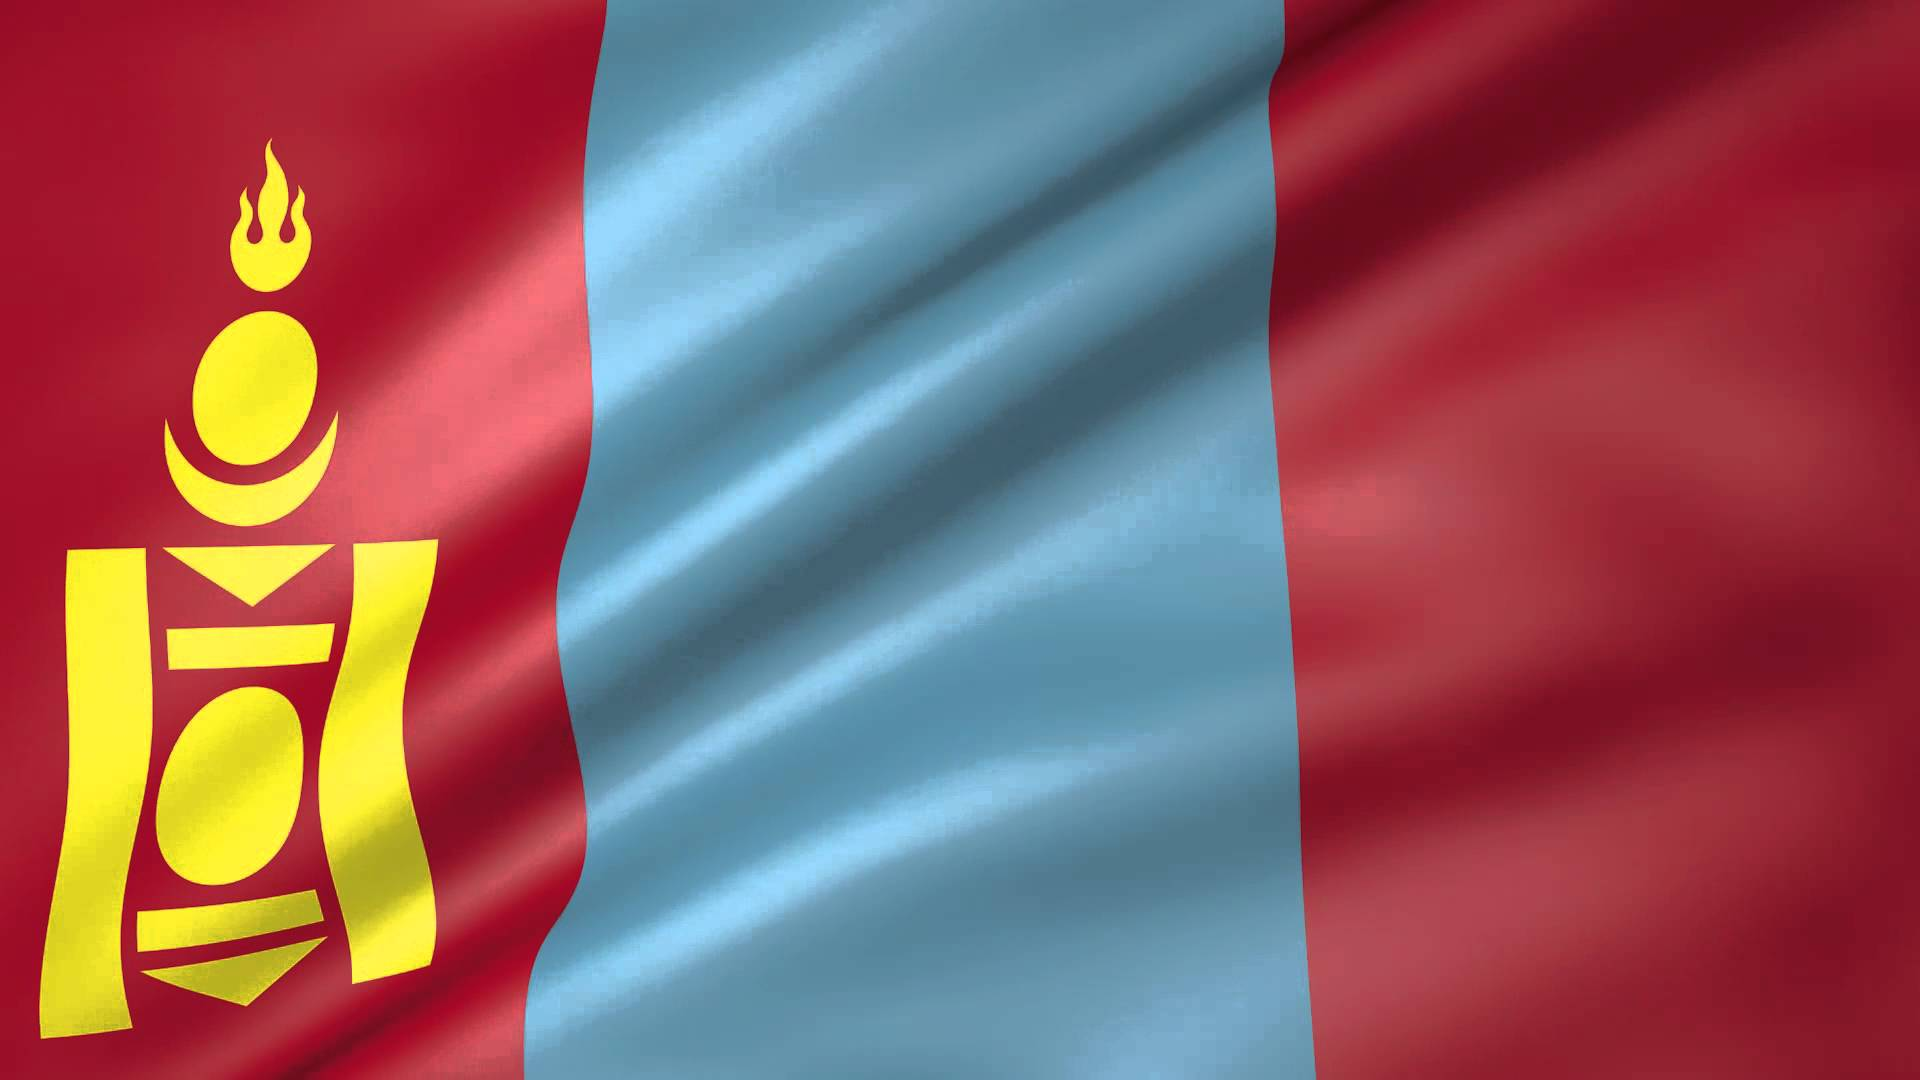 High Resolution Wallpaper   Flag Of Mongolia 1920x1080 px